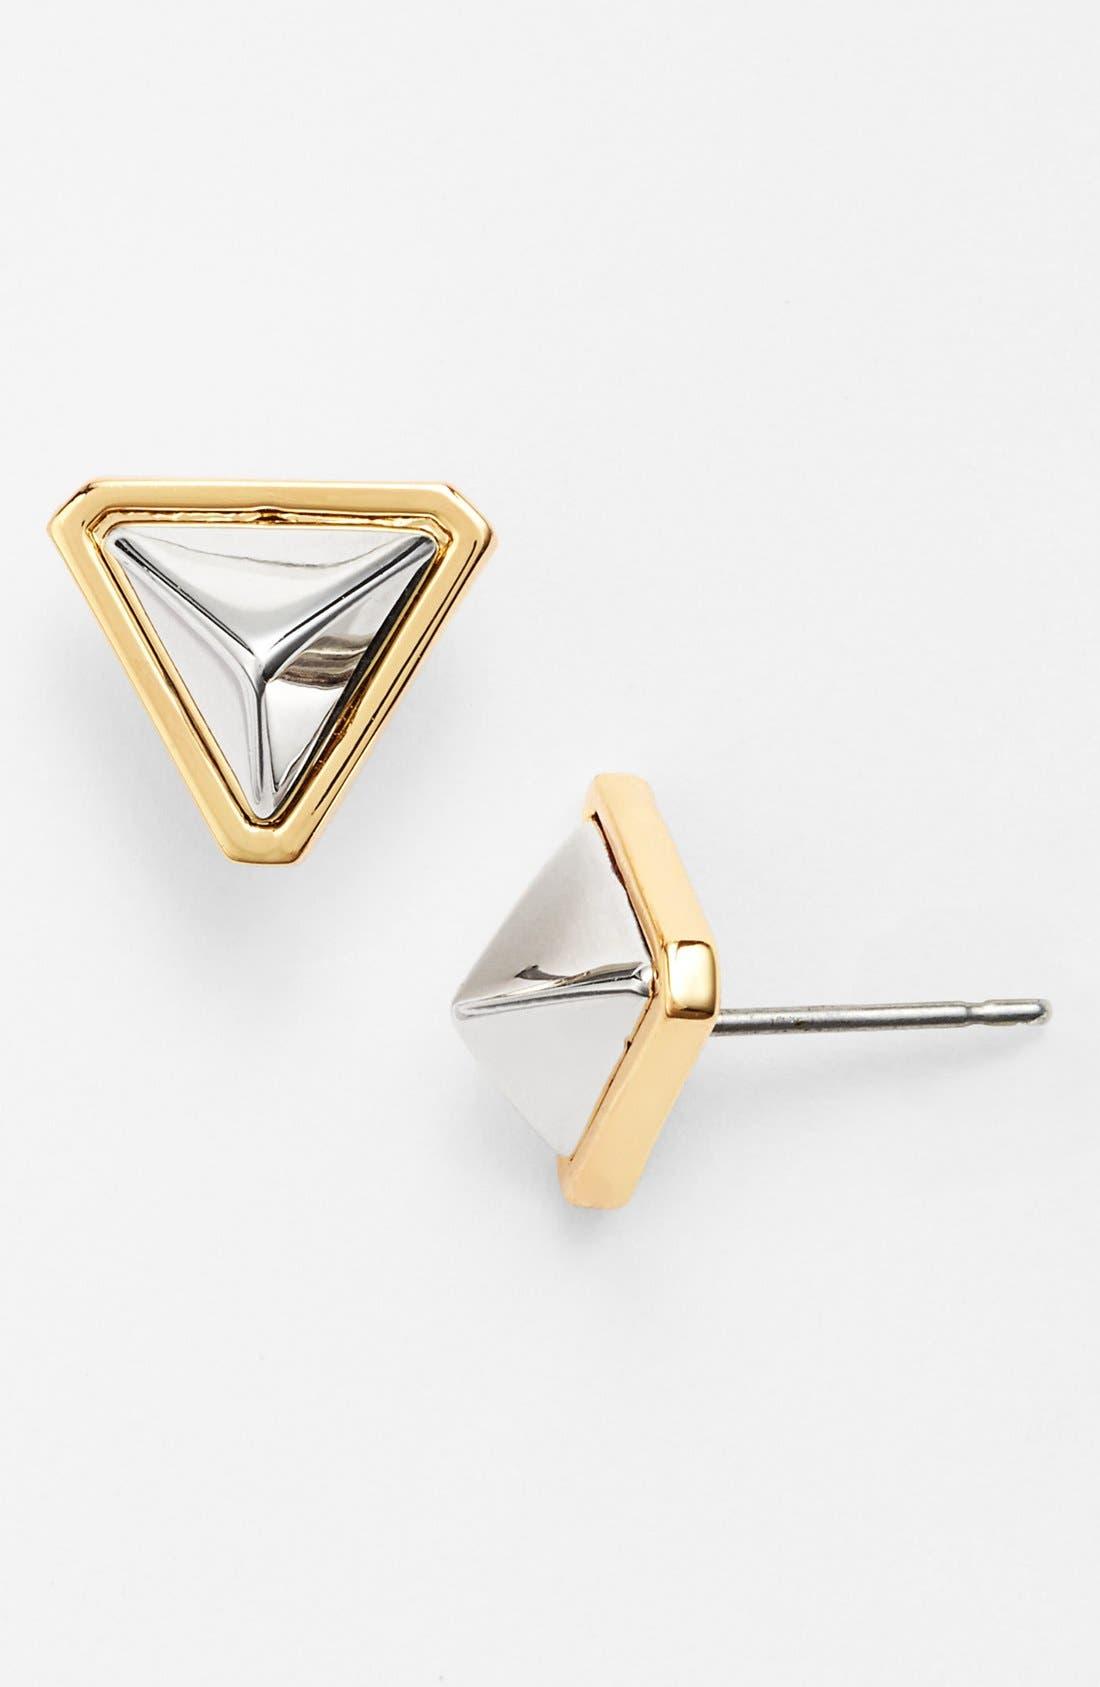 Main Image - Vince Camuto 'Mayan Metals' Stud Earrings